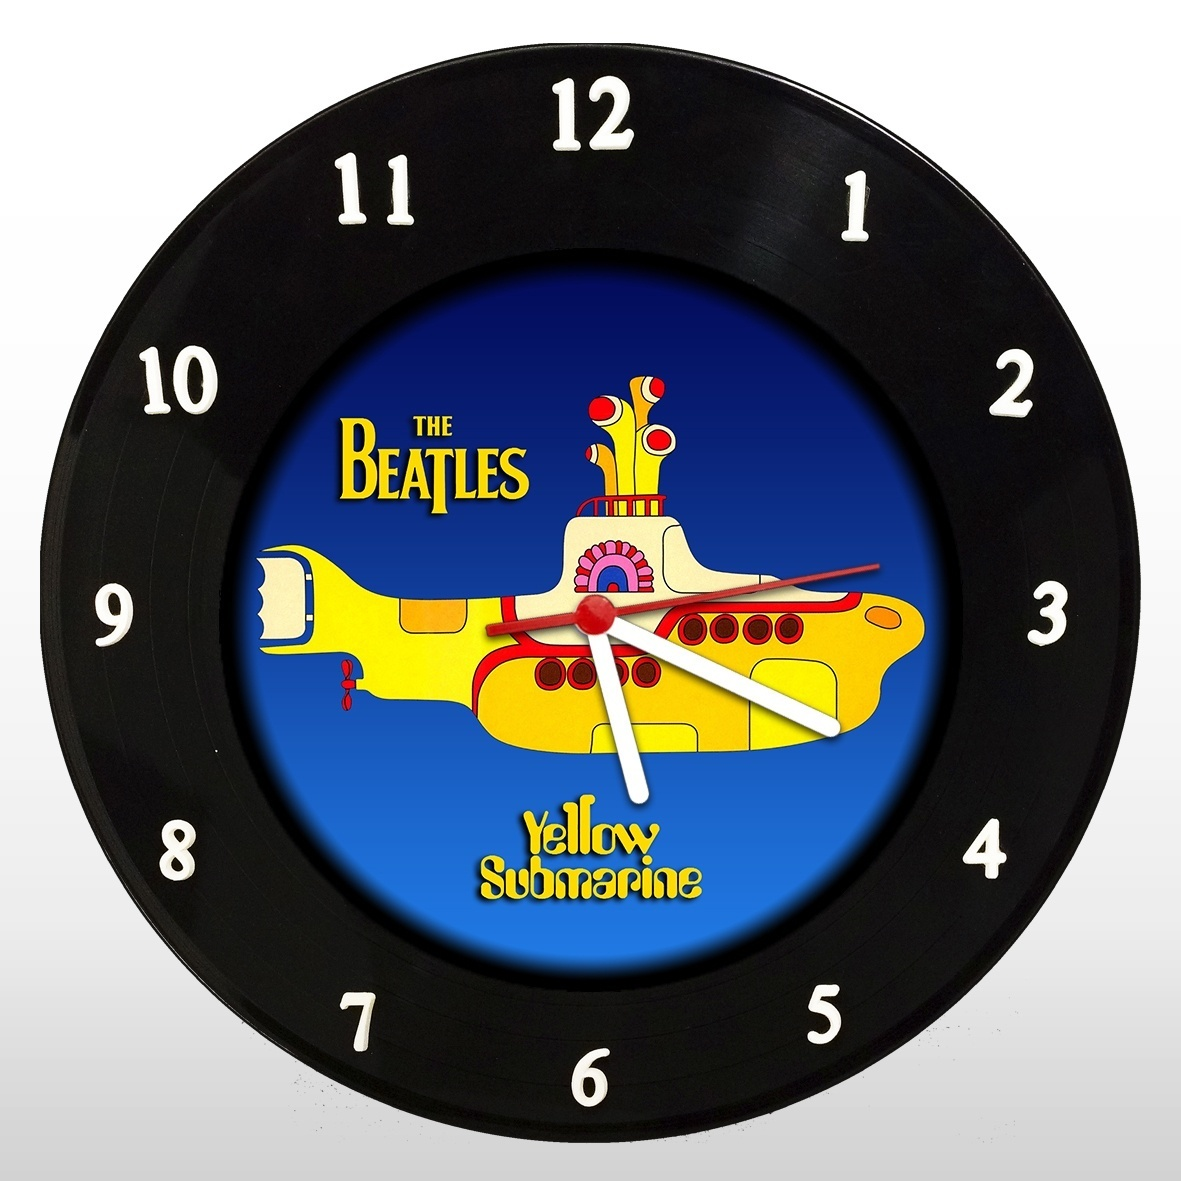 The Beatles - Yellow Submarine - Relógio de Parede em Disco de Vinil - Mr. Rock